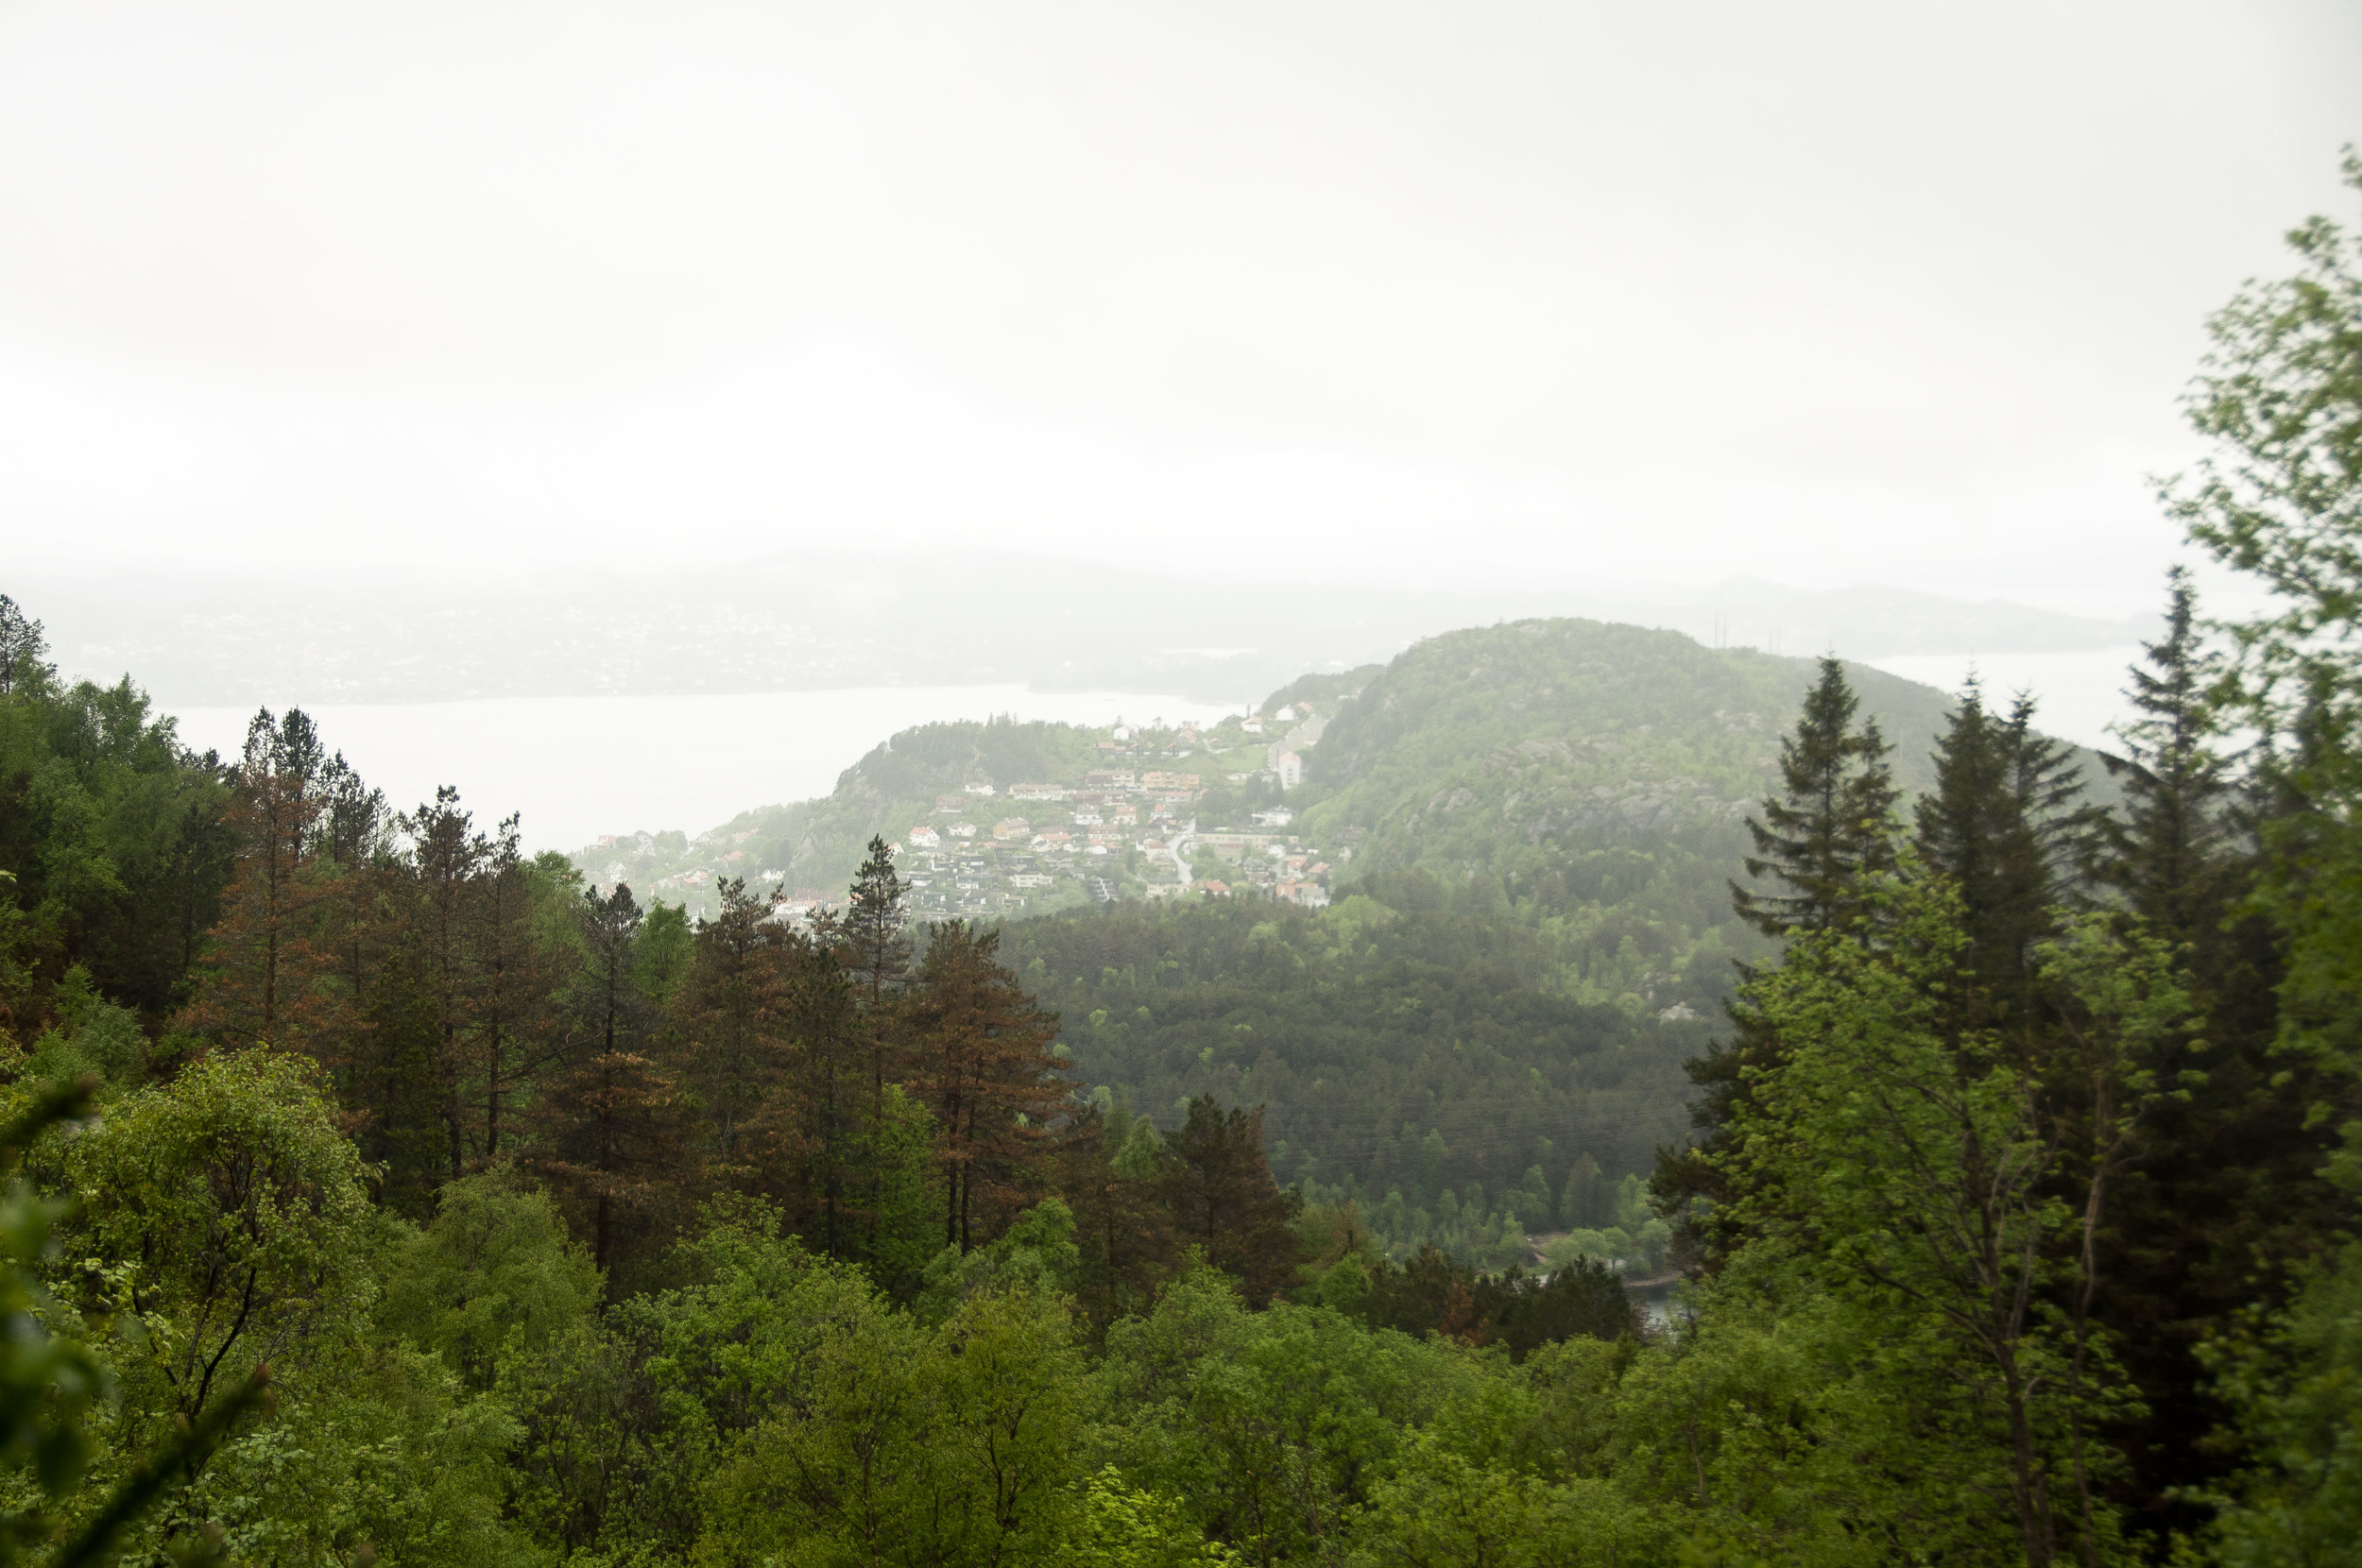 Bergen001.jpg